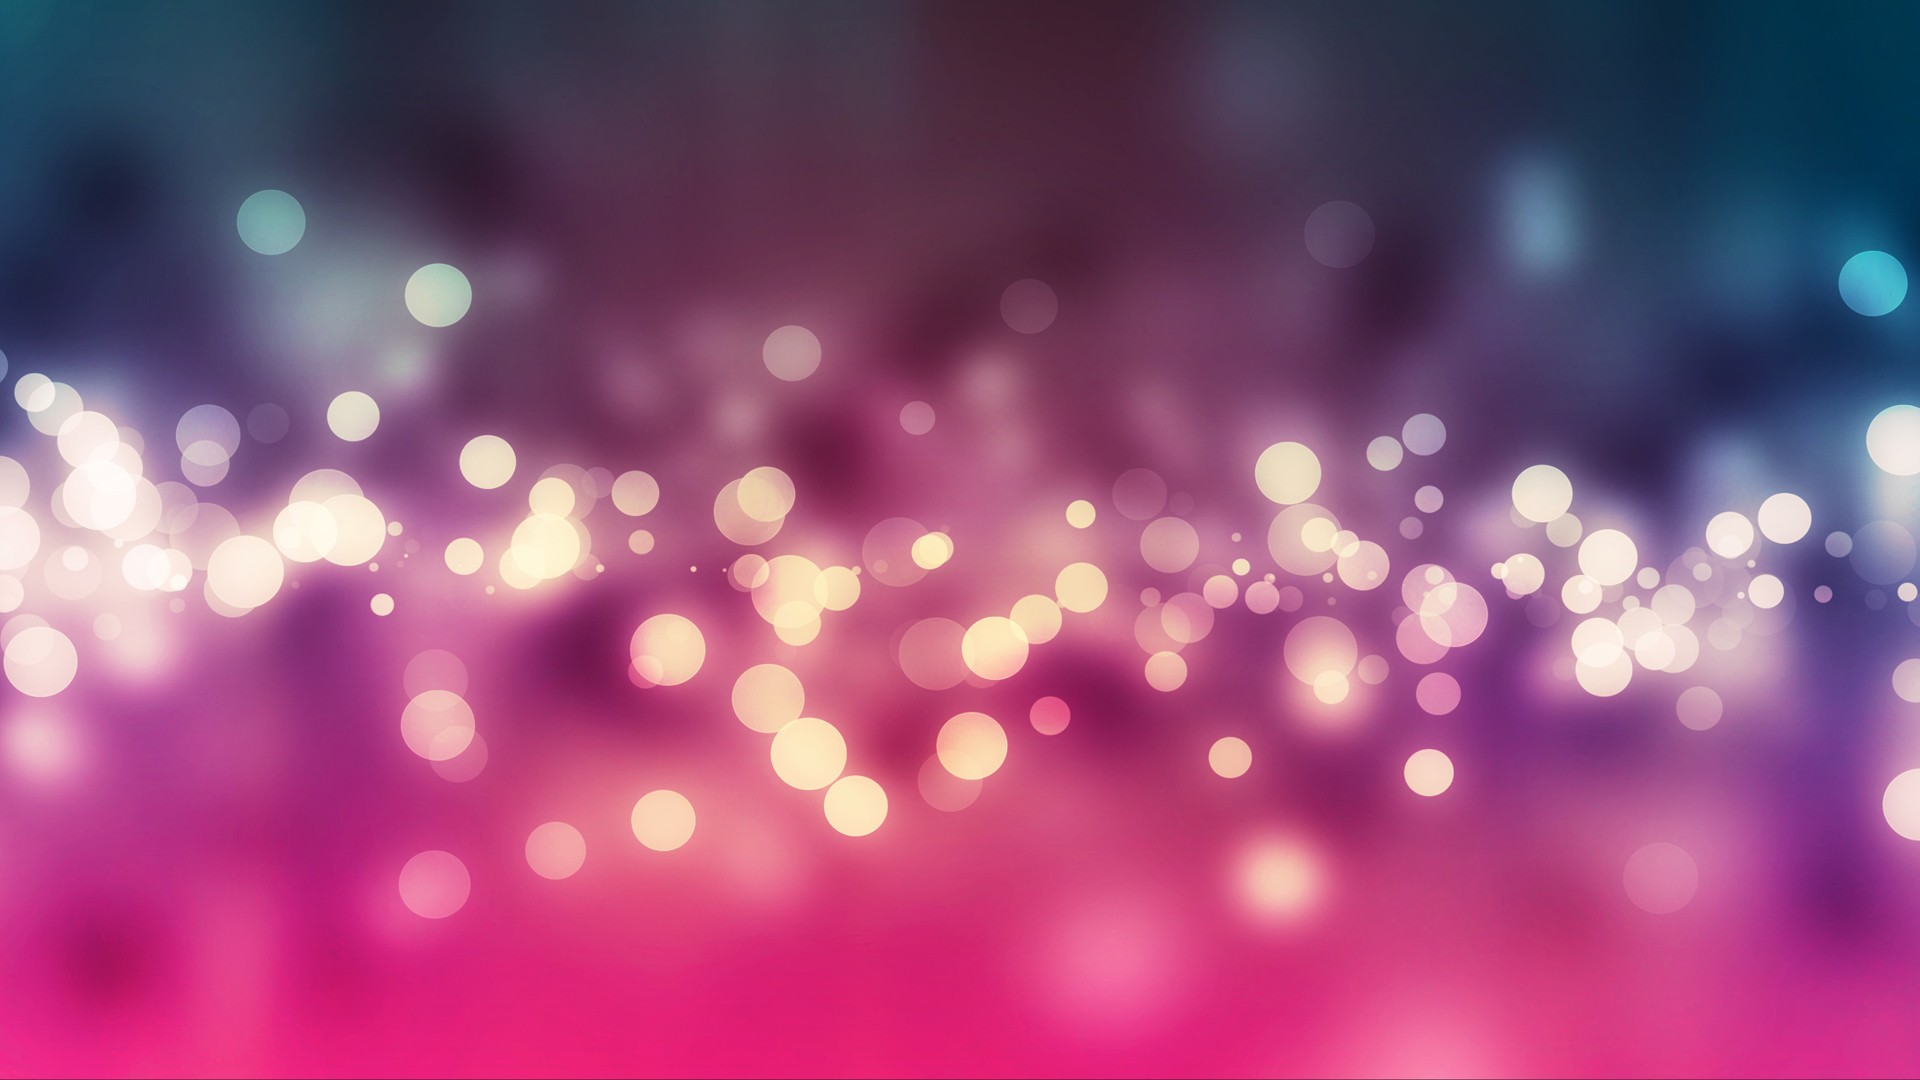 Download Lights Bokeh Wallpaper 1920x1080 Wallpoper 427380 1920x1080